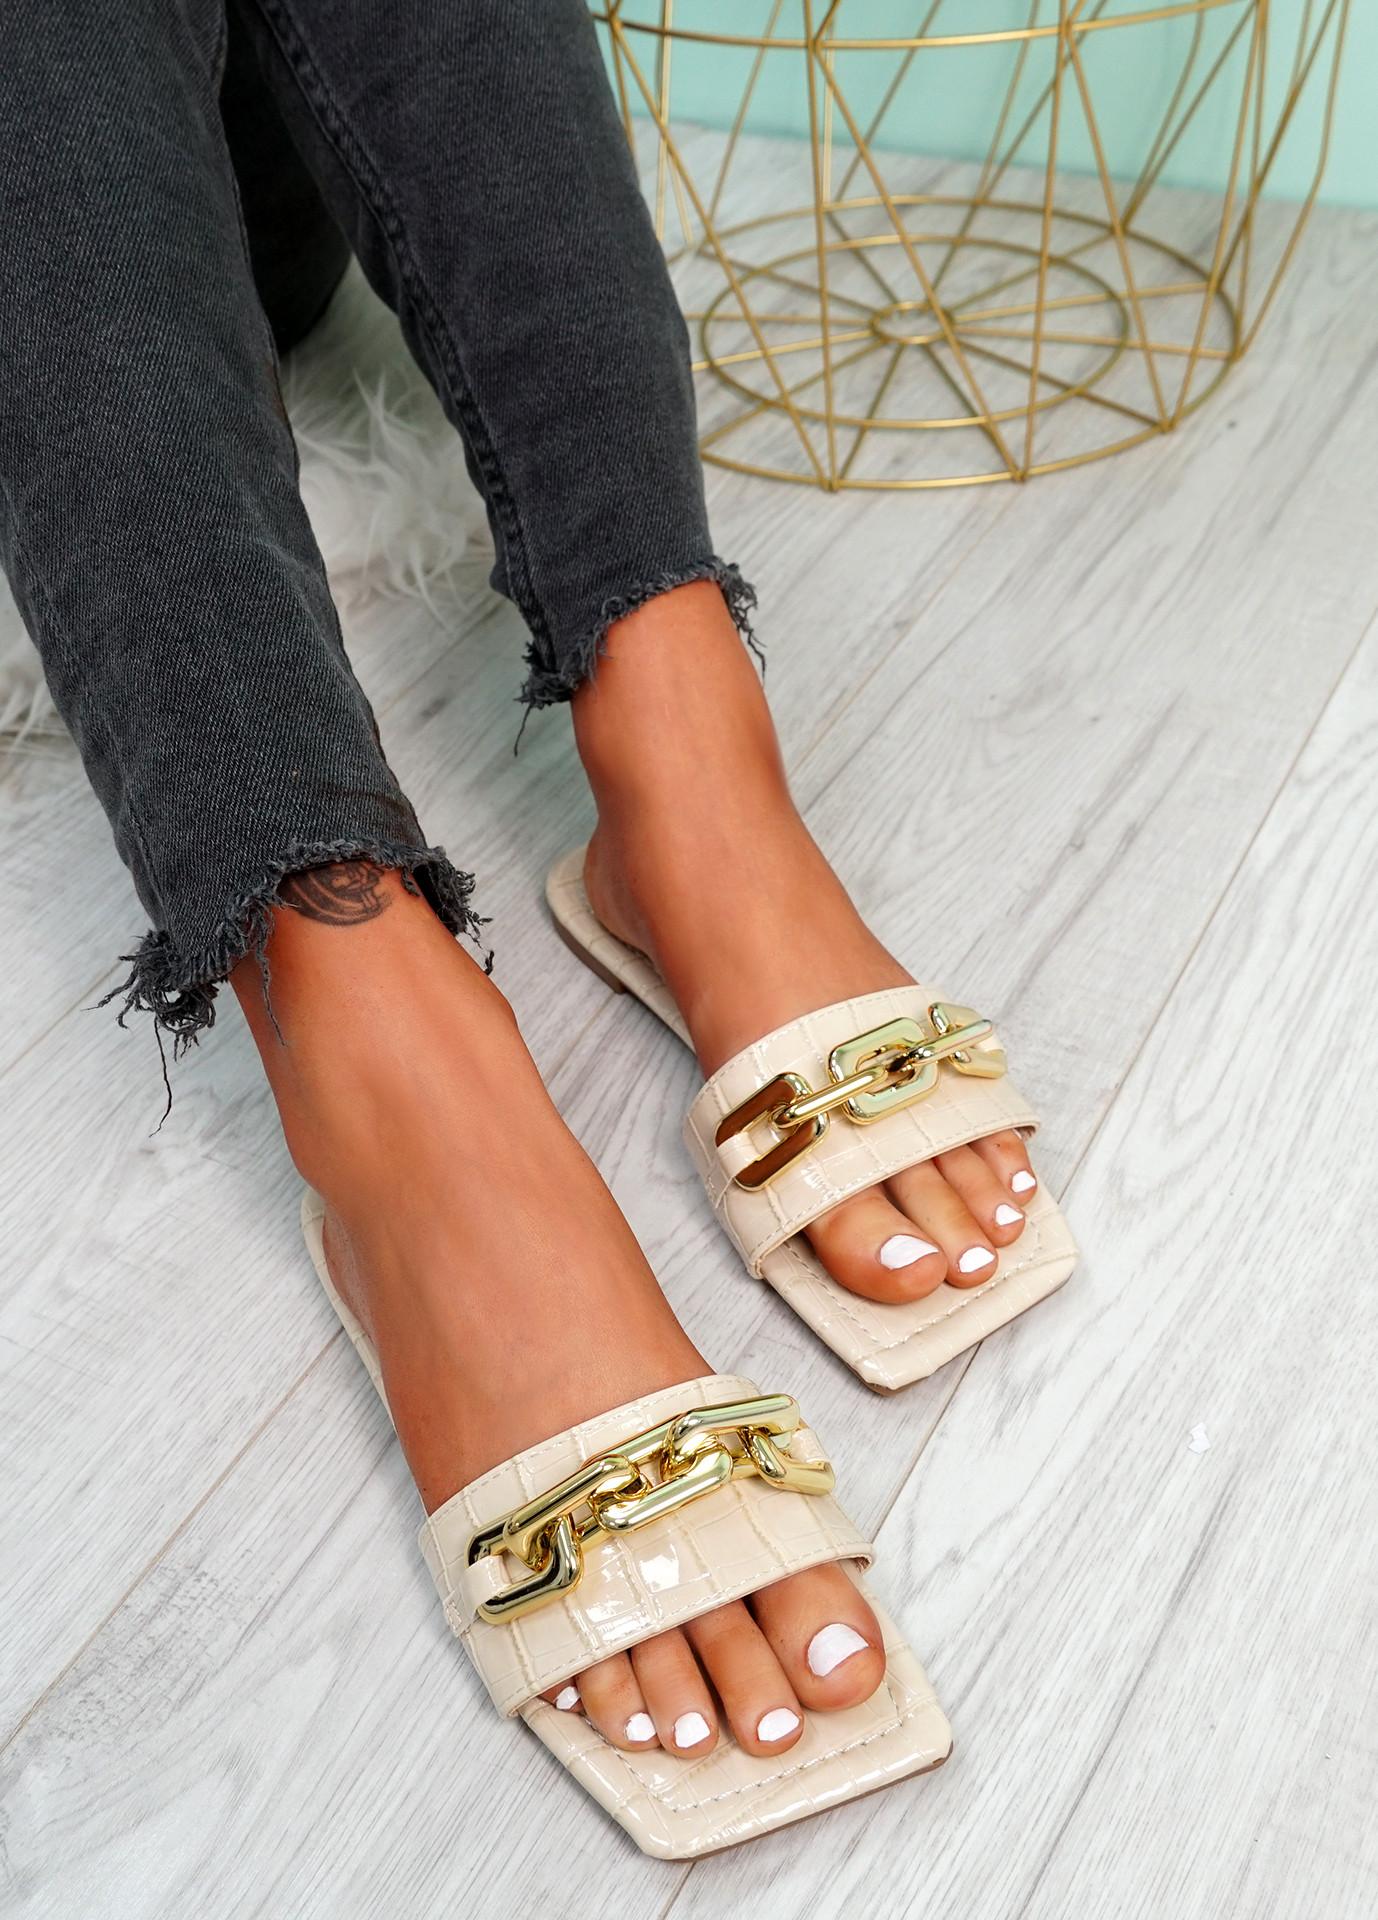 Loxy Beige Croc Pattern Flat Sandals